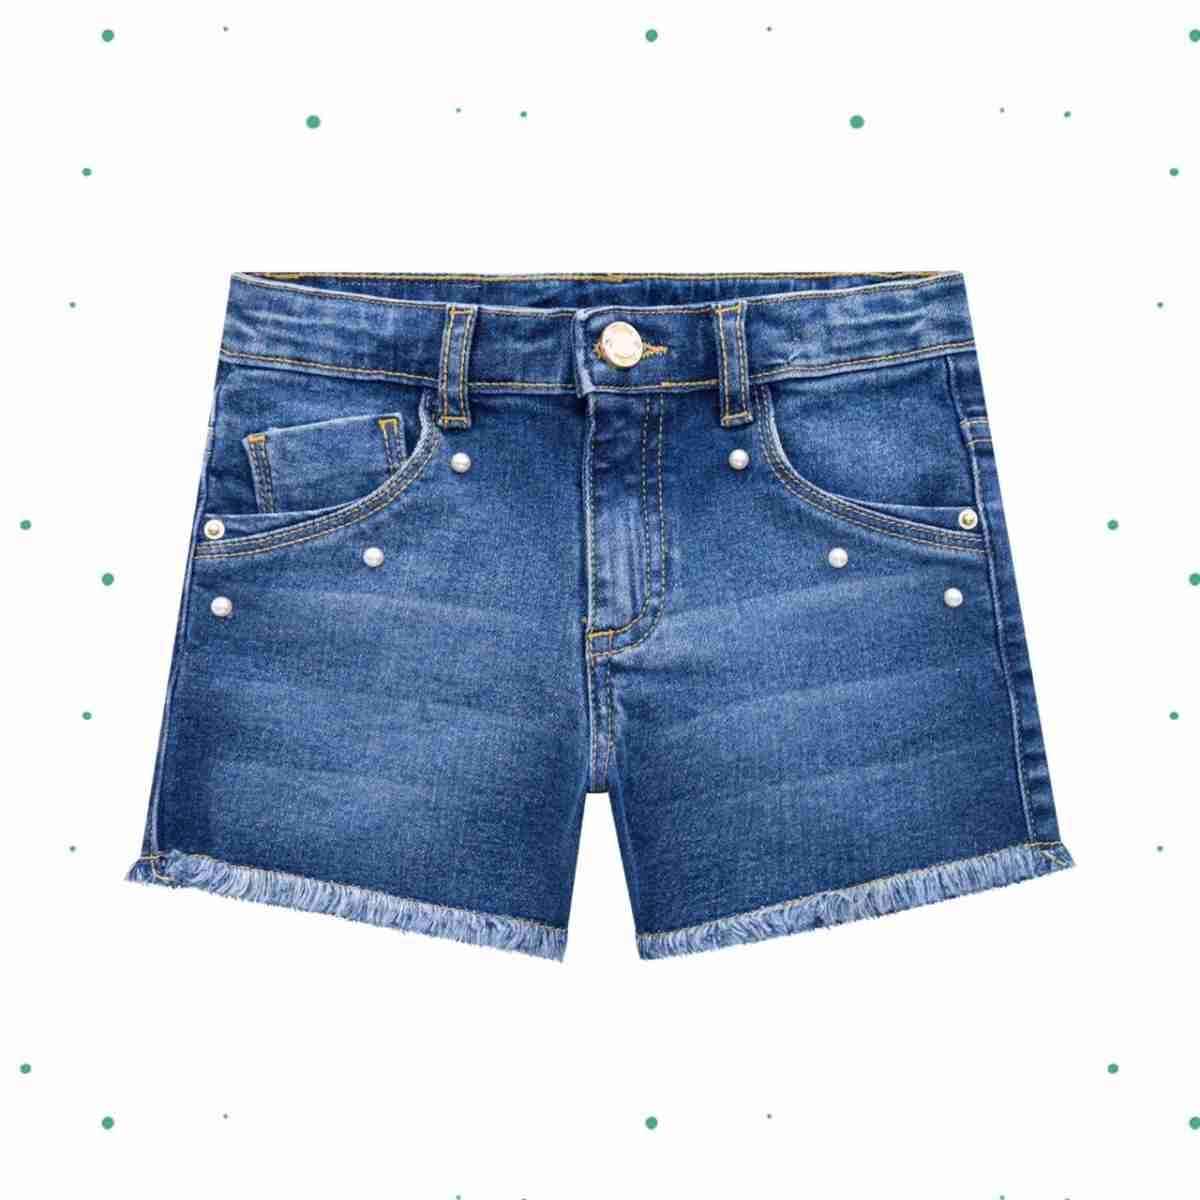 Shorts Infantil Feminino Milon em Jeans com Elastano